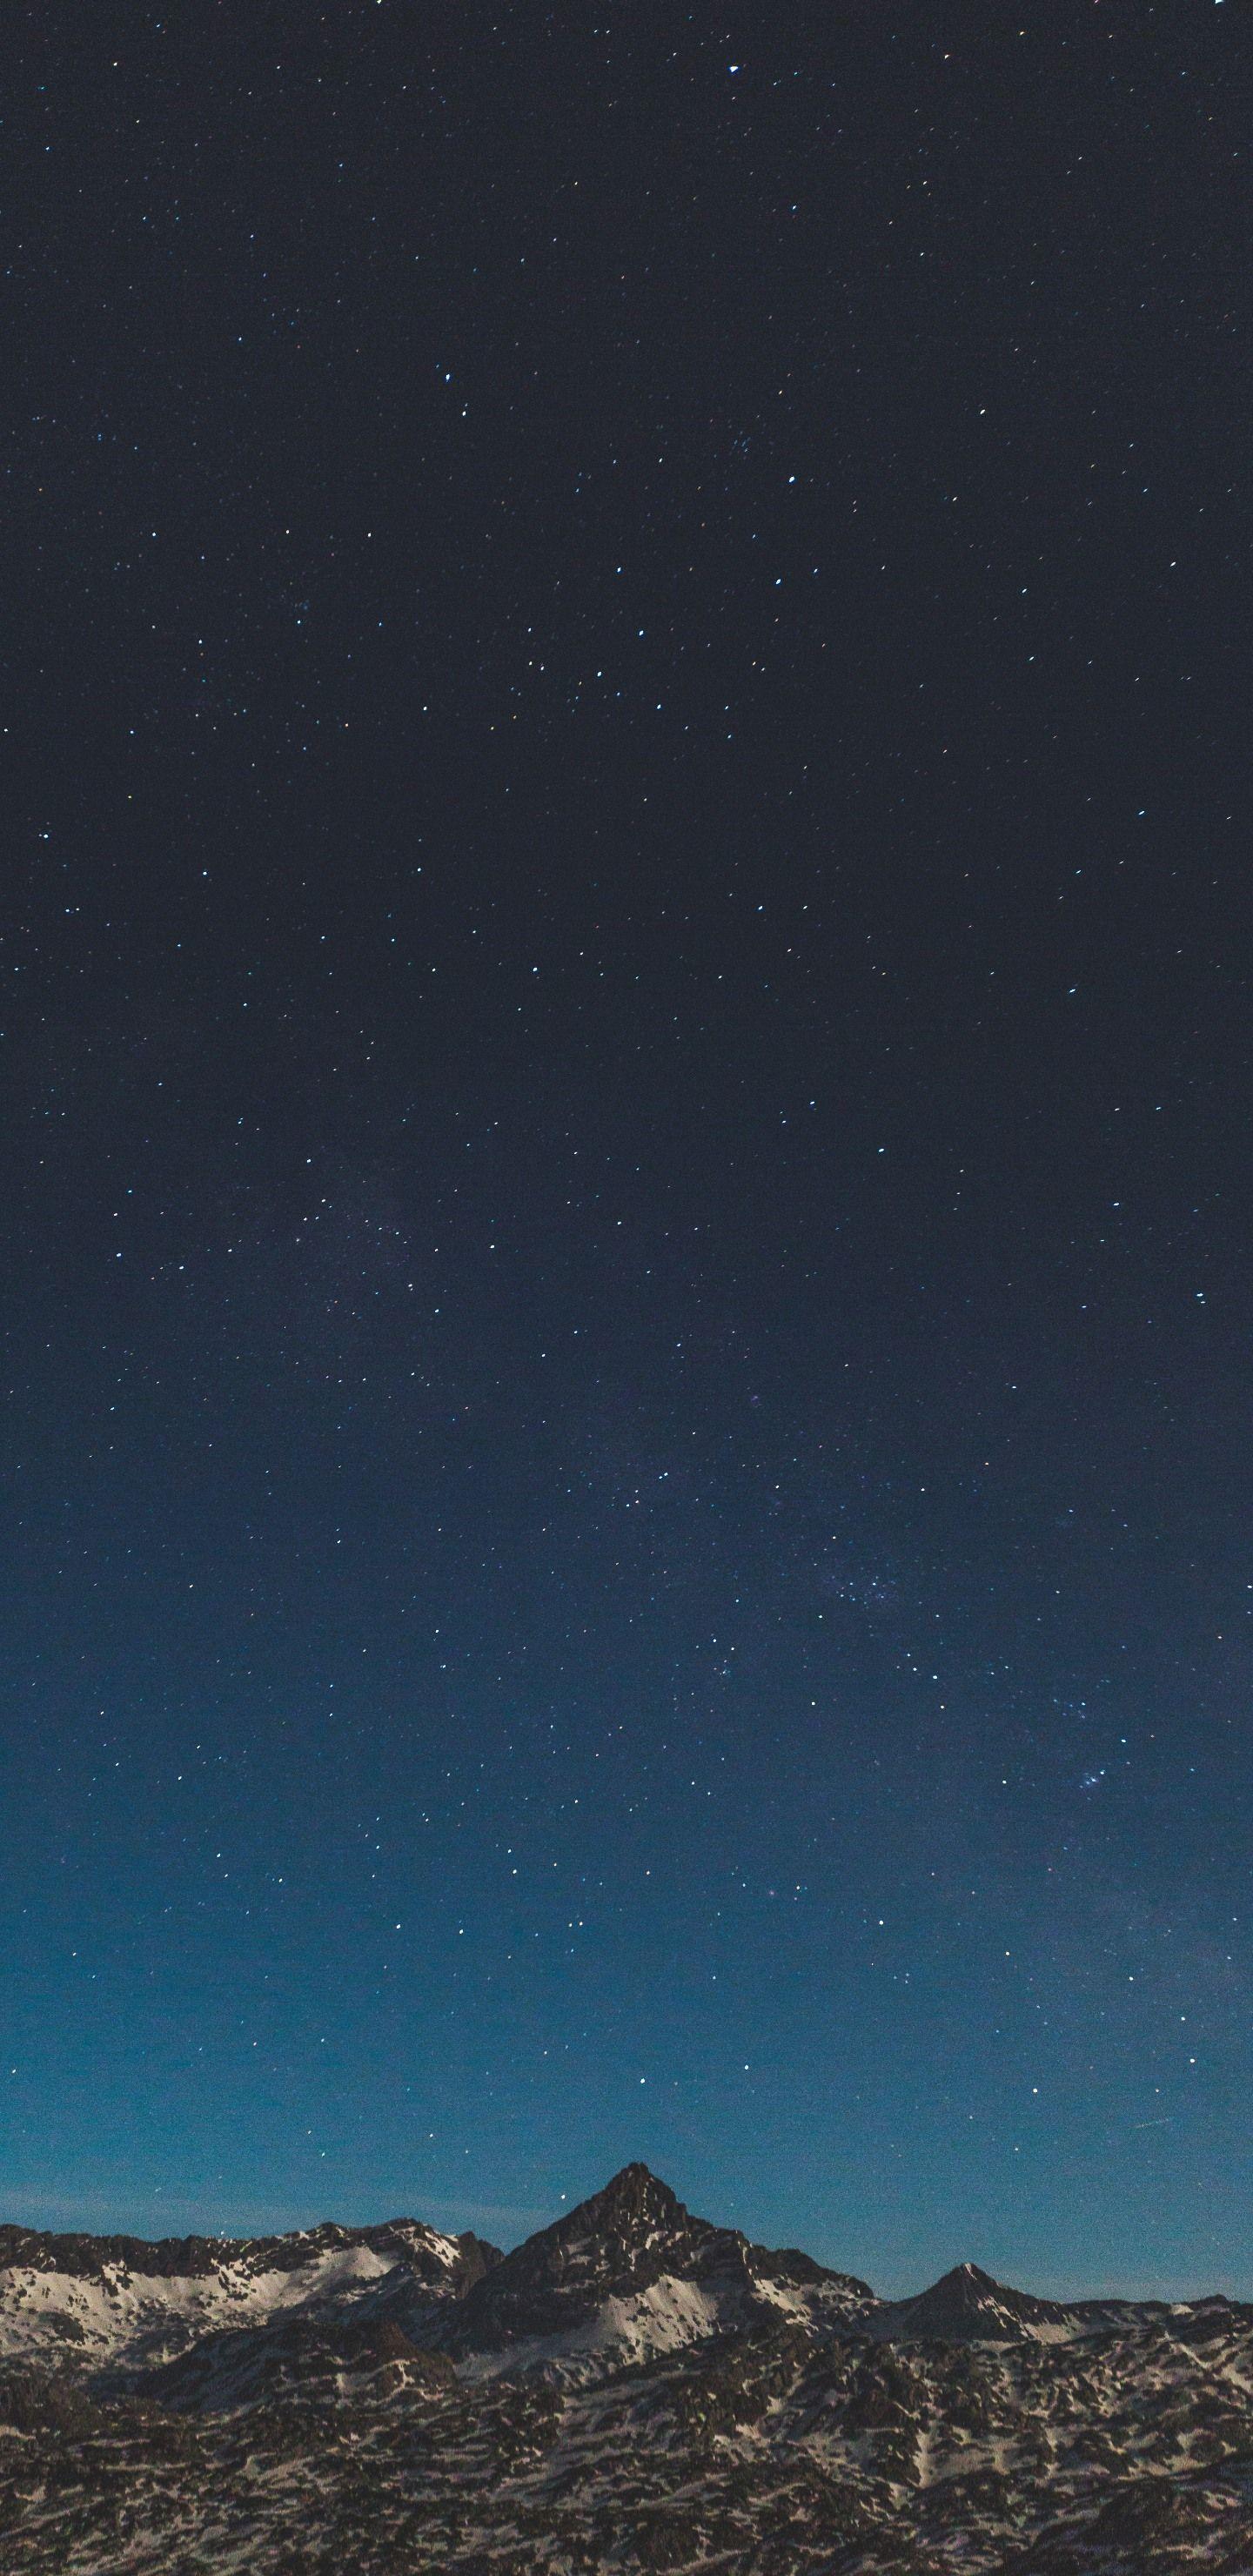 "4896x3264 Galaxy Wallpapers [Free Download!] | 66 best free galaxy wallpaper ..."">"